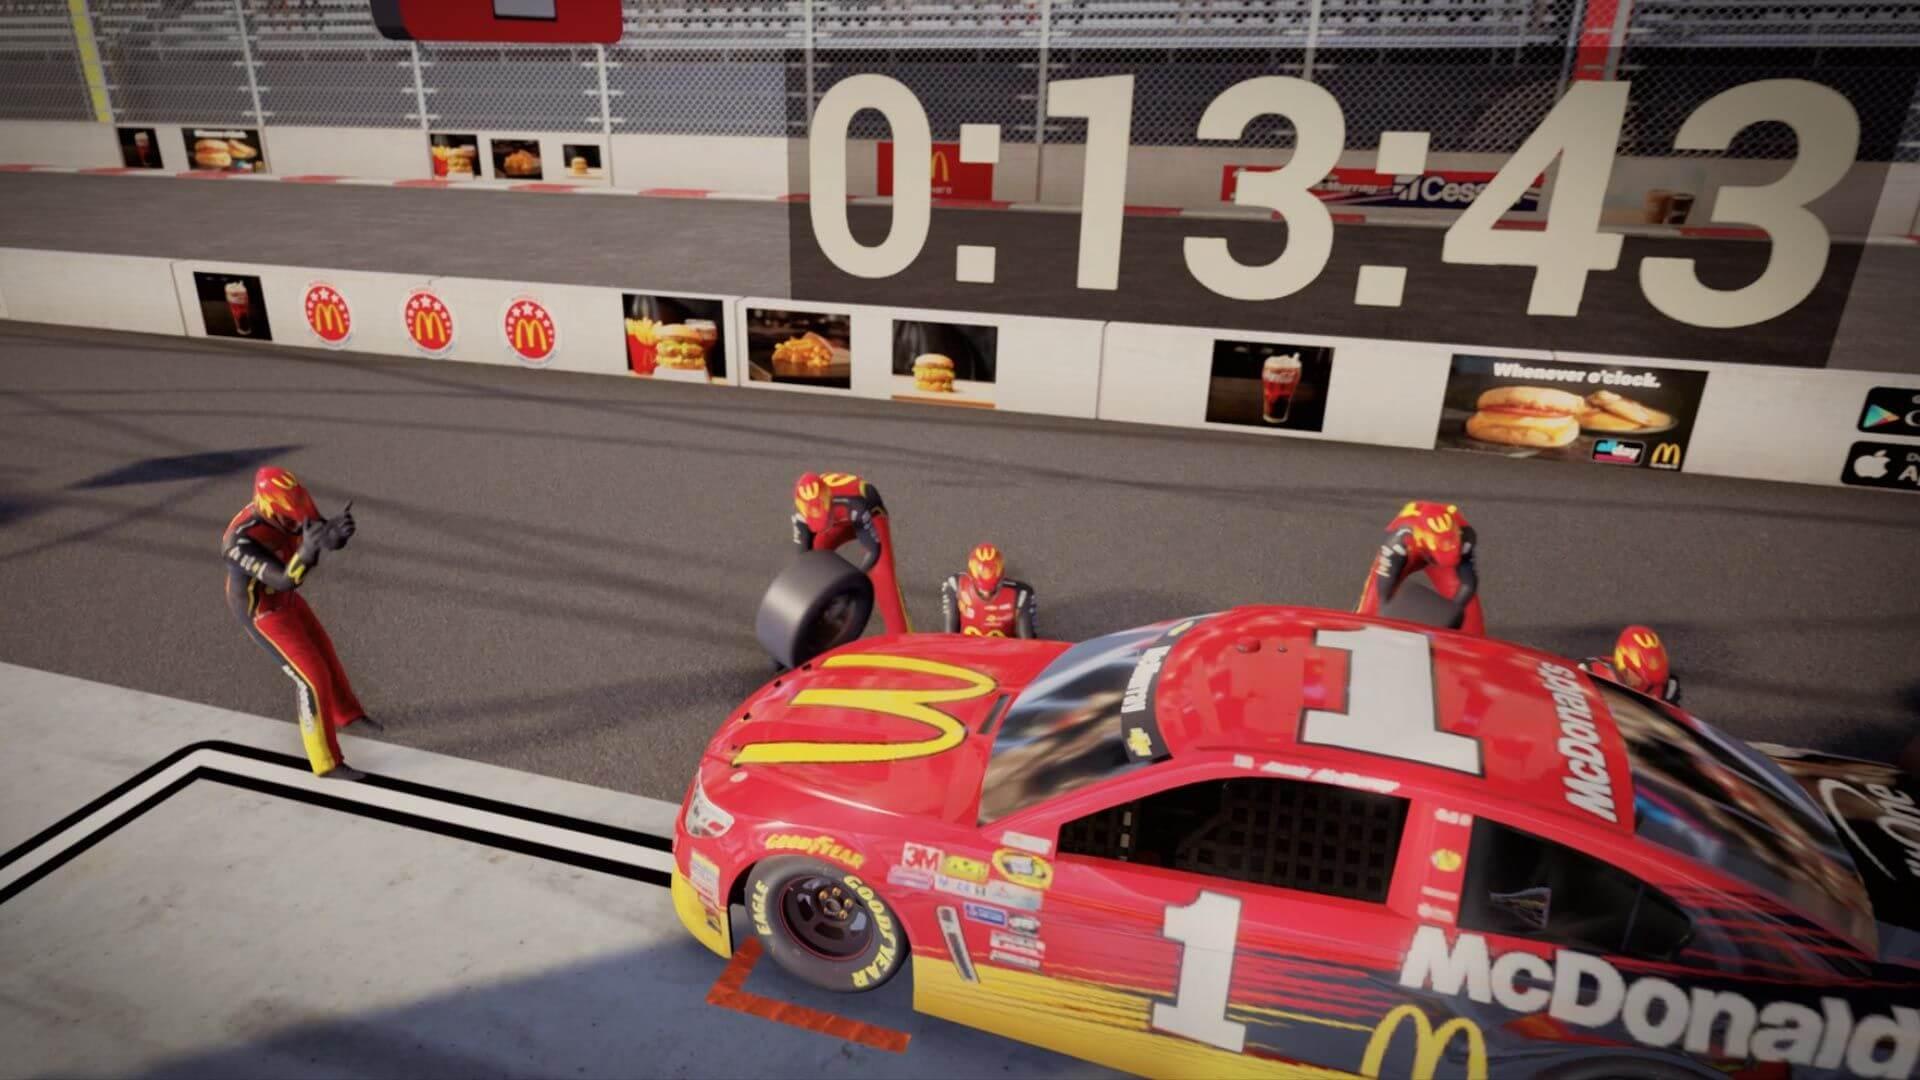 McDonald's: Brand virtual reality sports activation